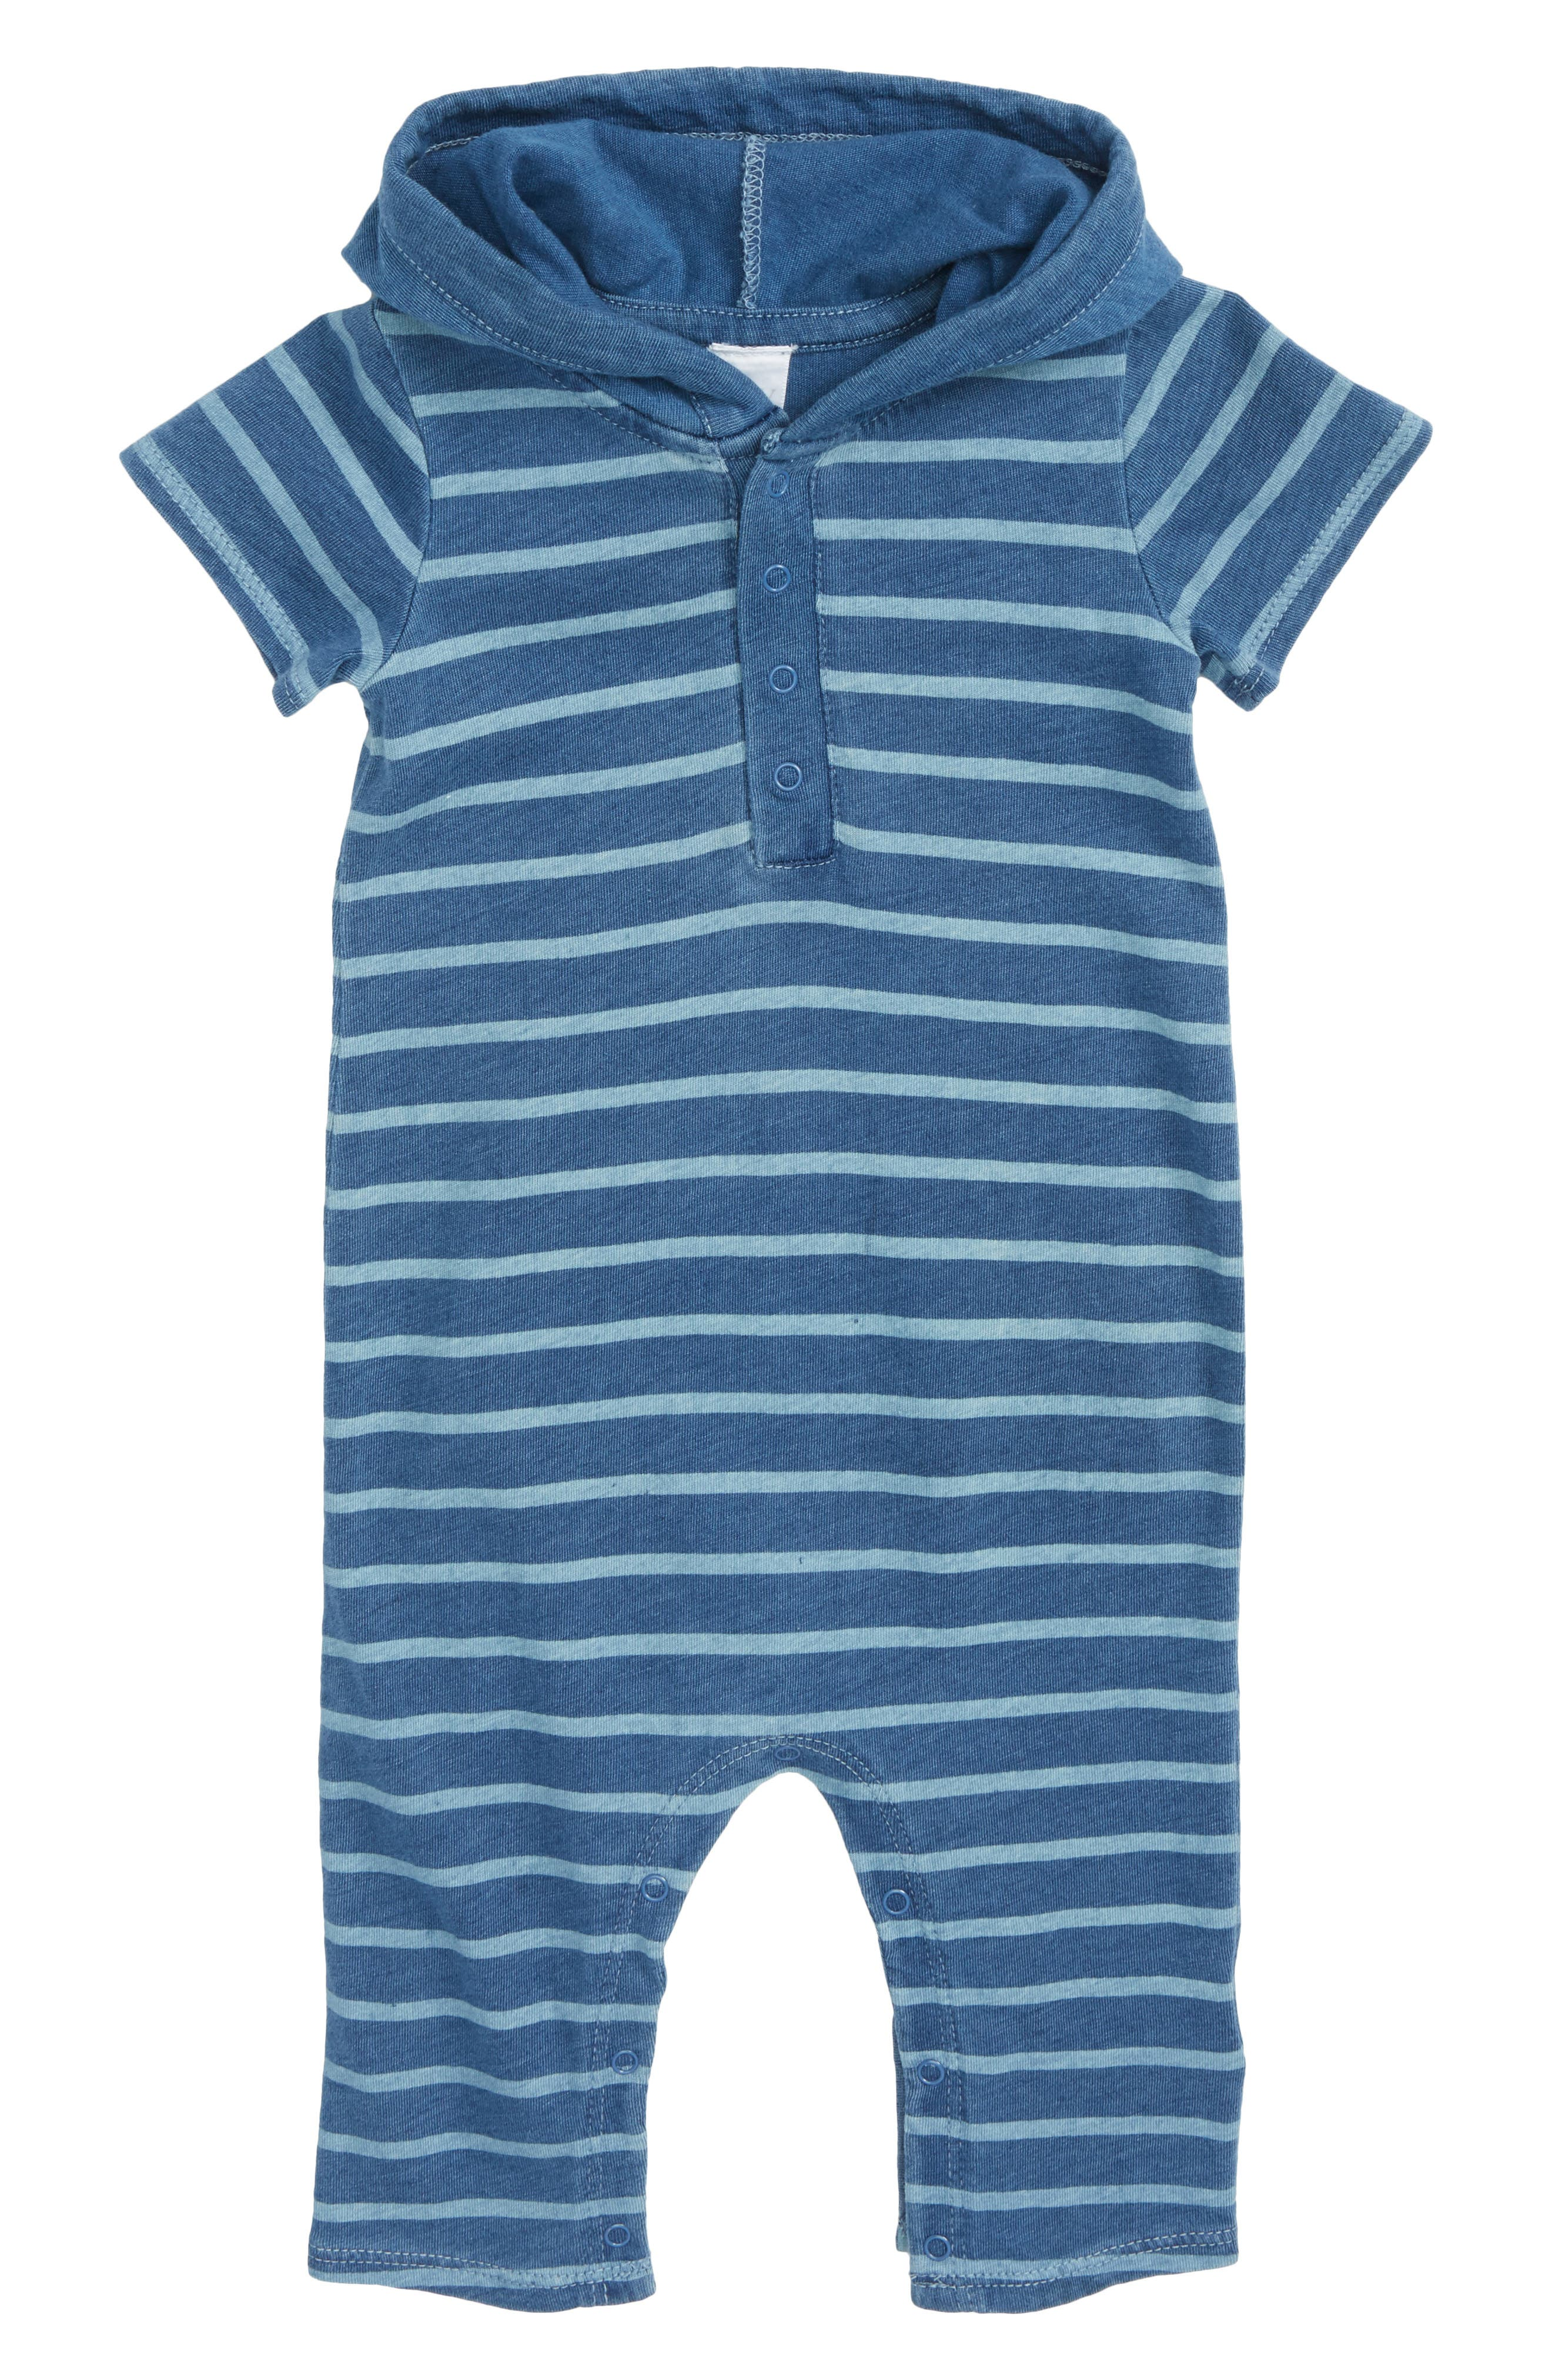 Hooded Romper,                         Main,                         color, Blue Indigo Breton